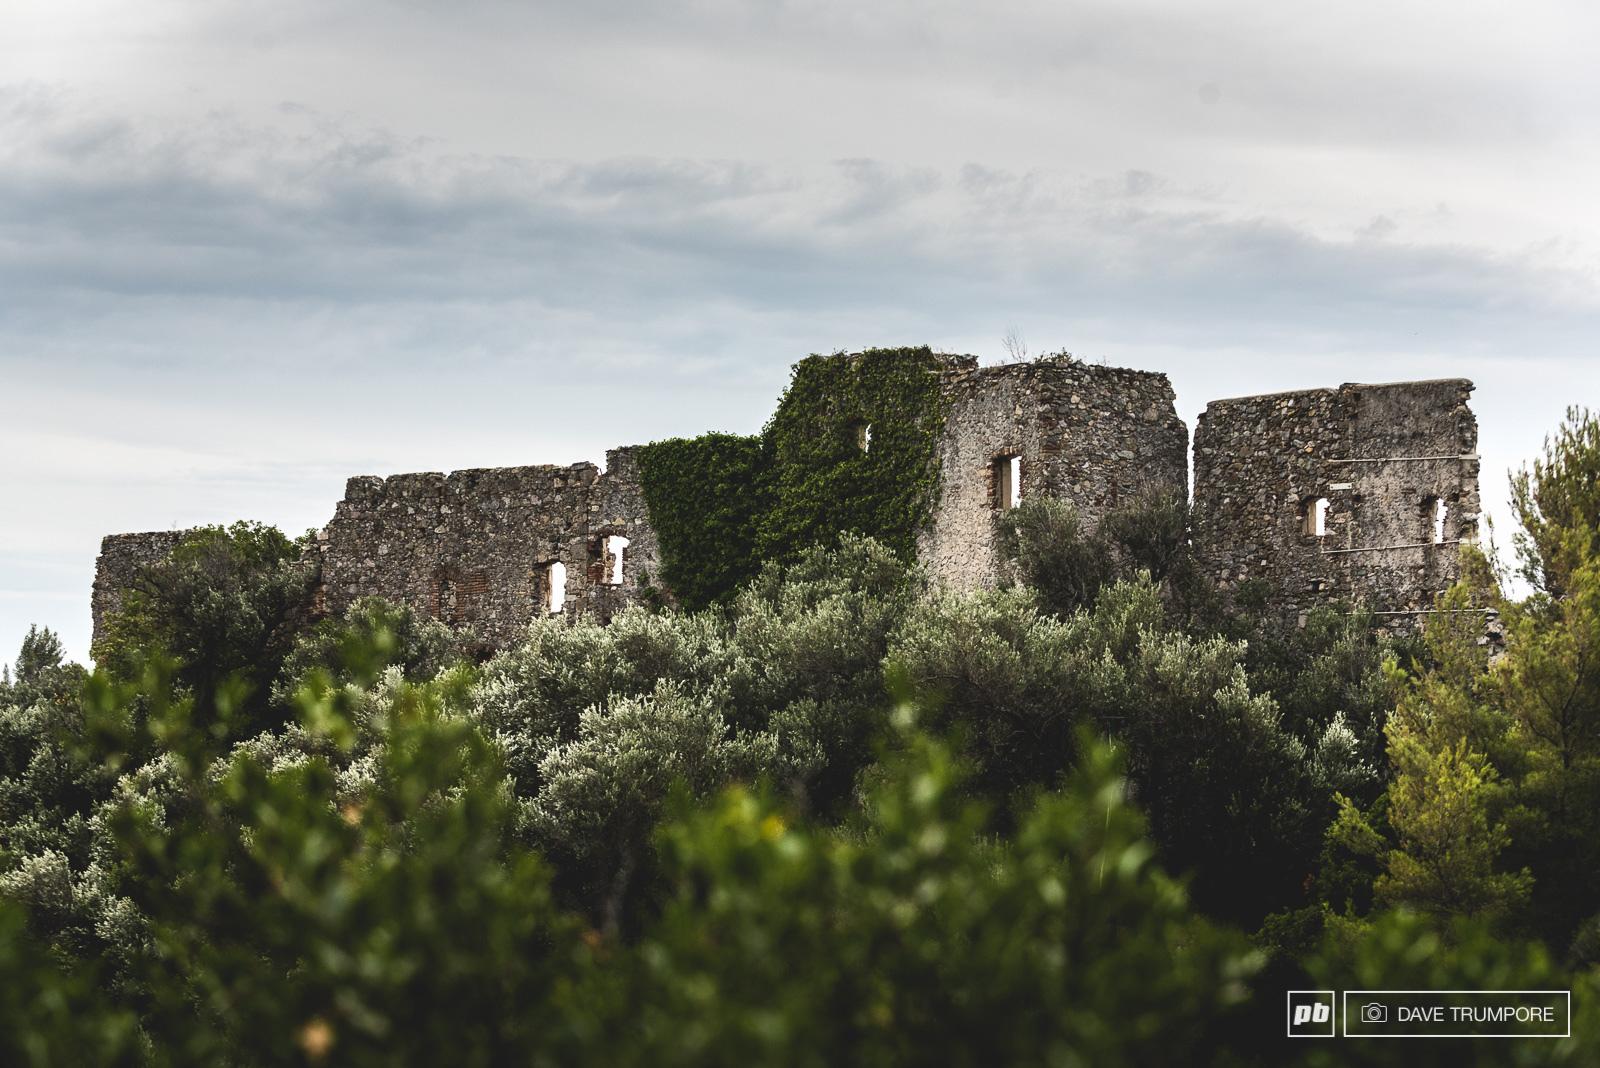 Riding through the history of human settlement along the Mediterranean coastline.